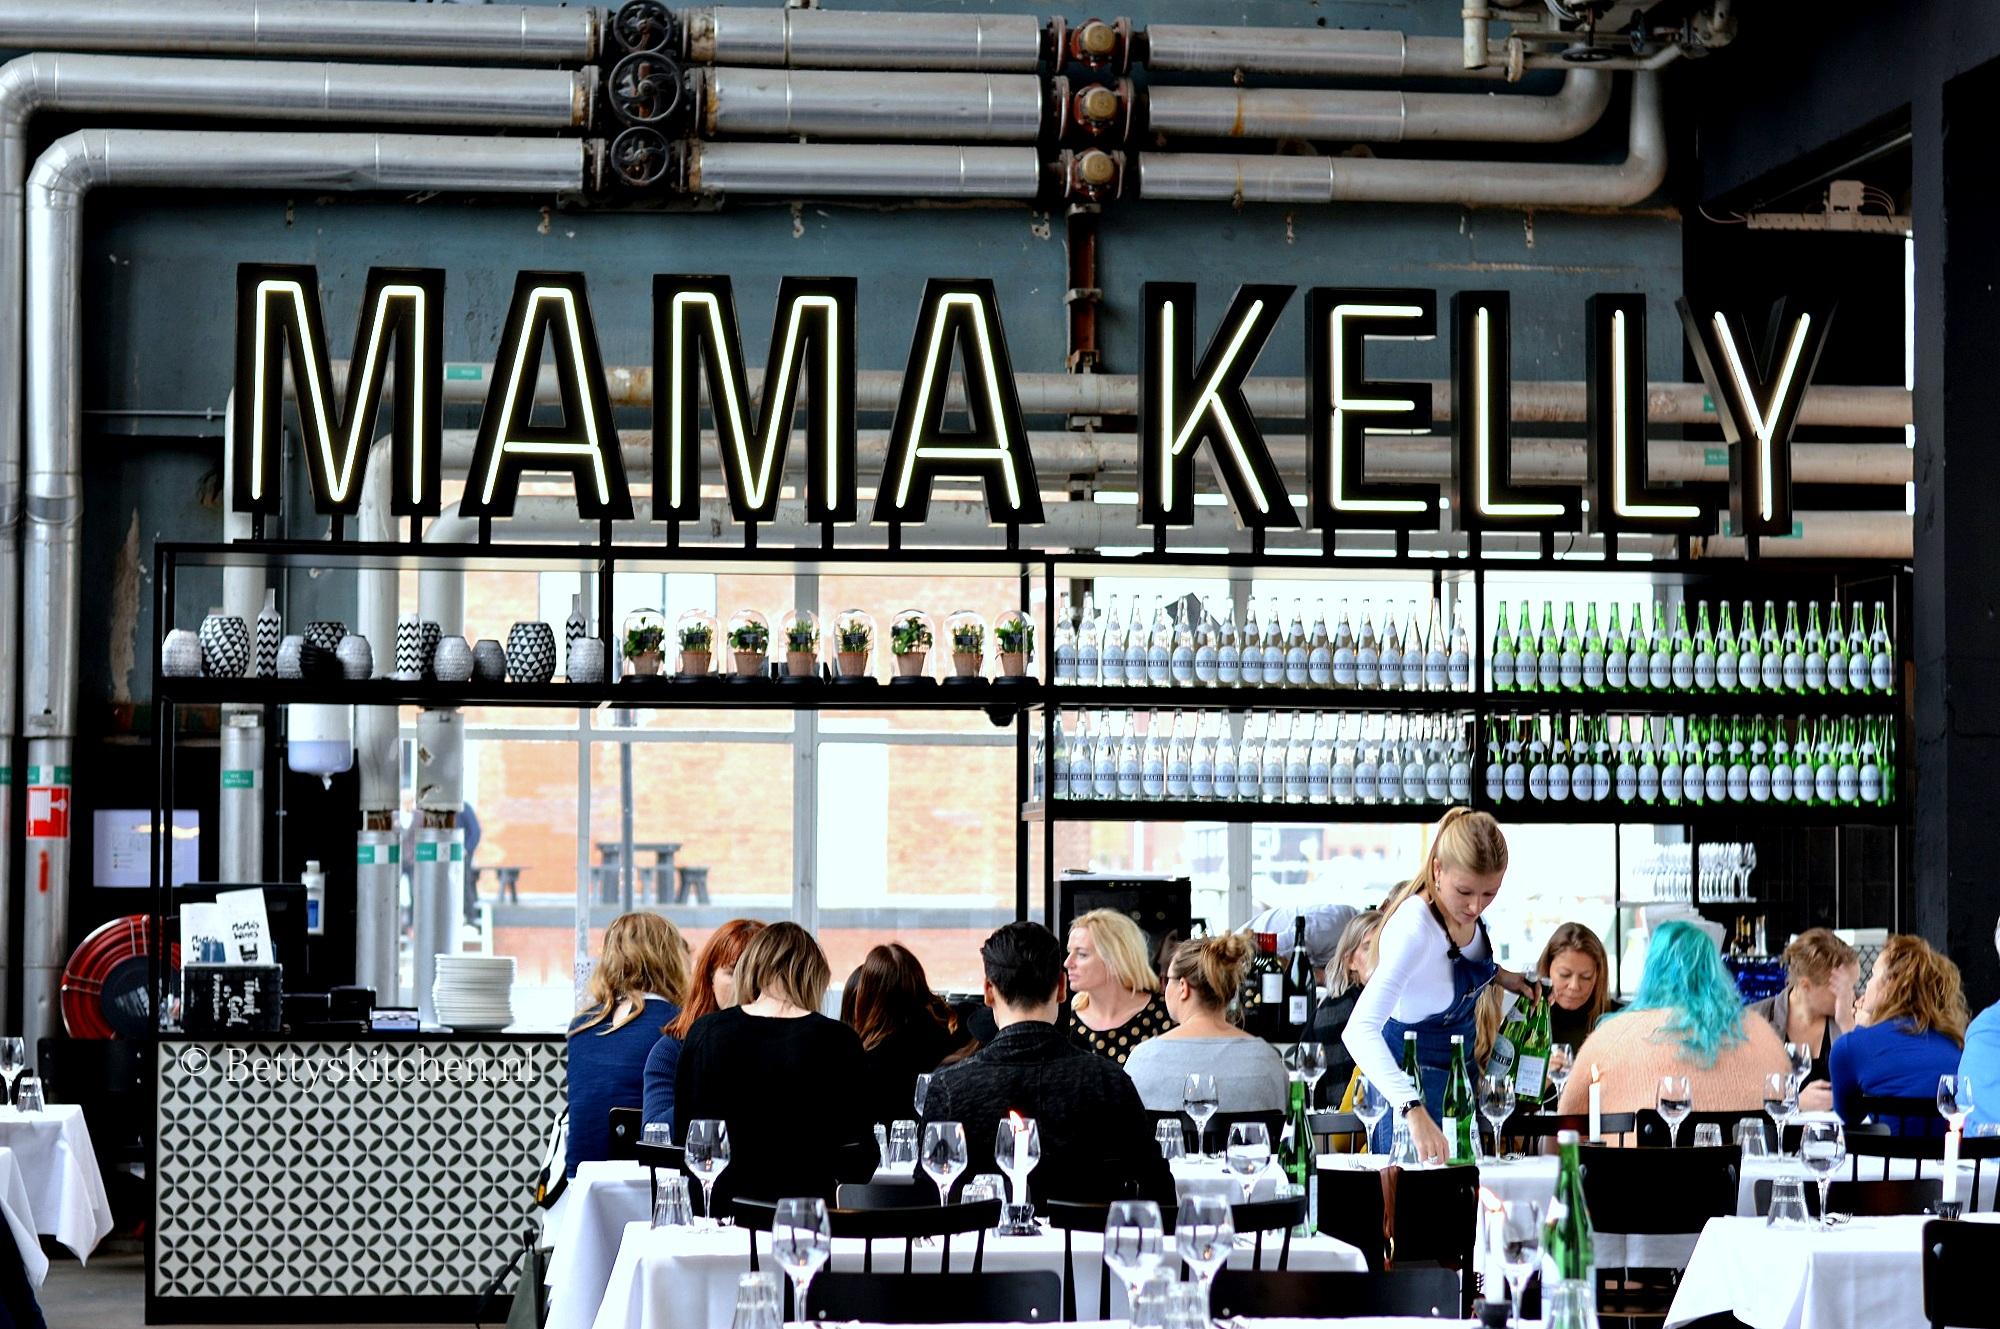 MaMa Kelly – Den Haag